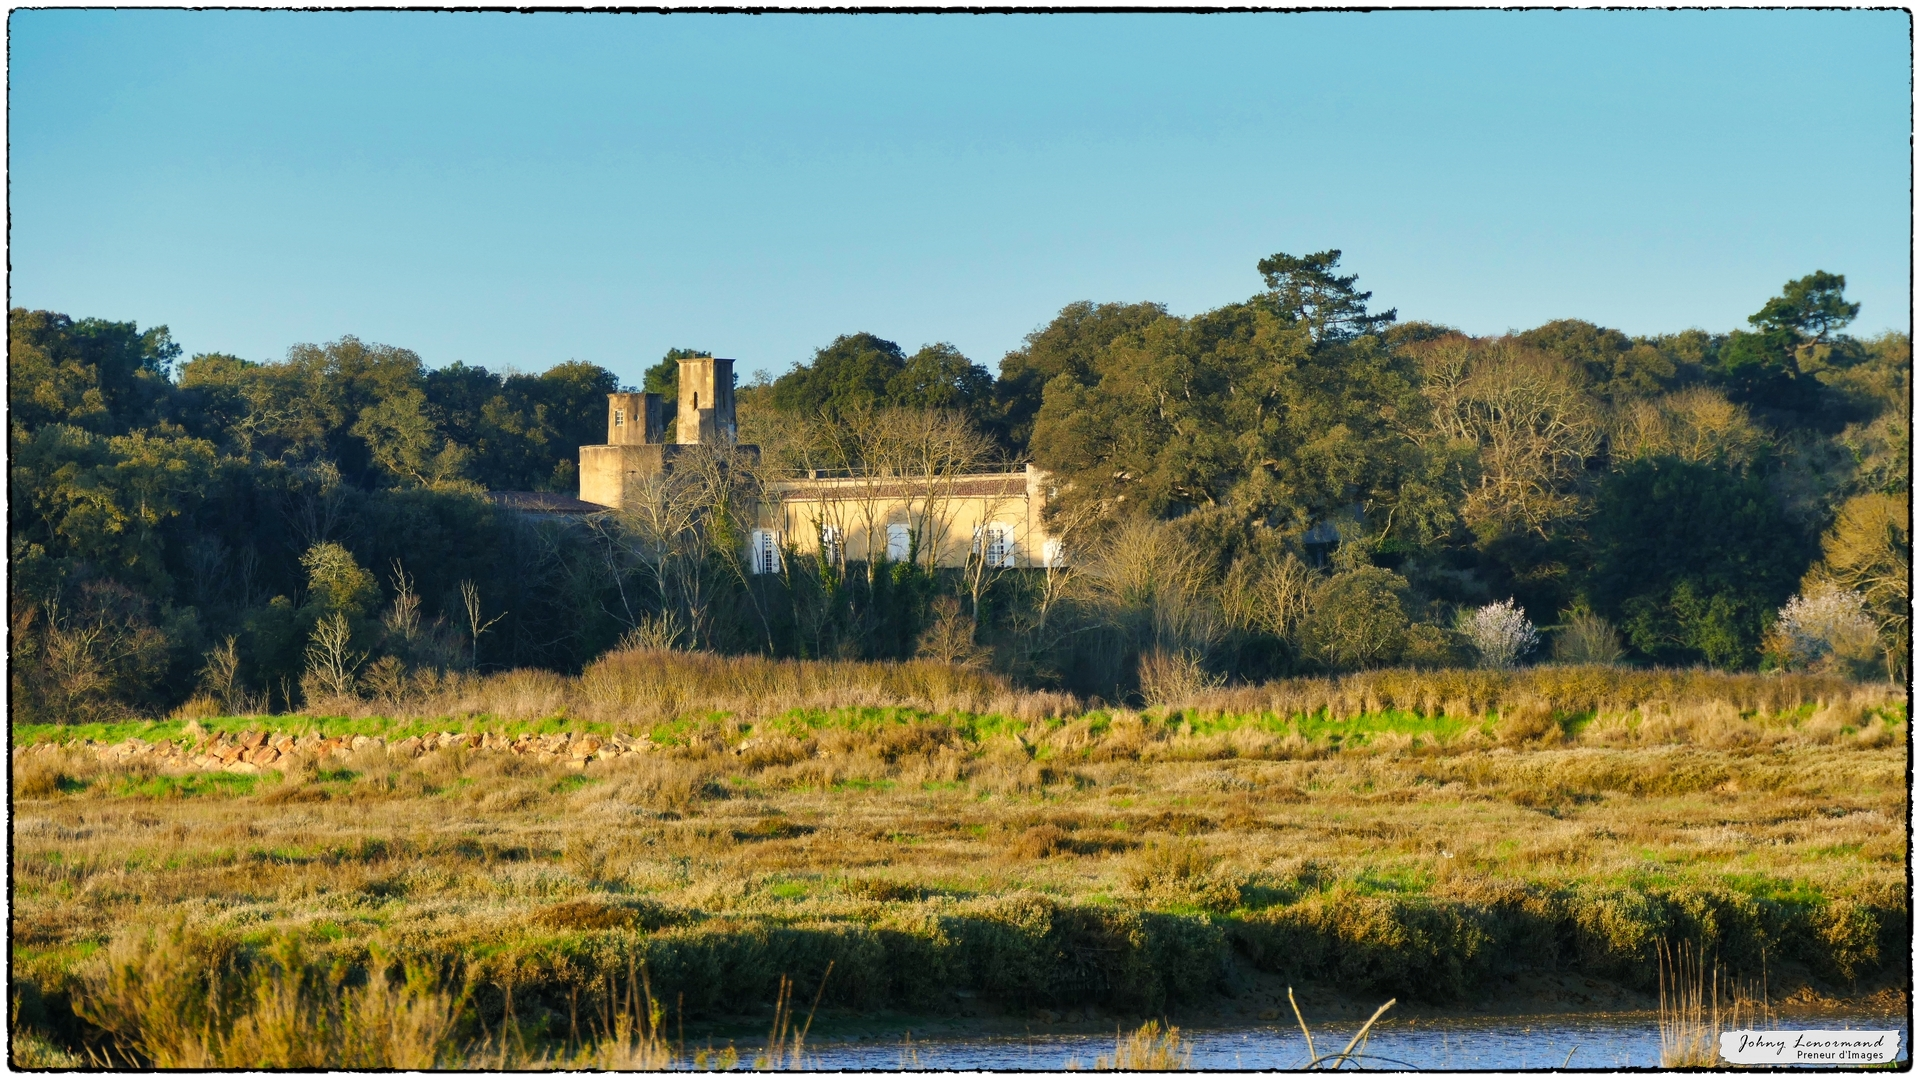 Château du Veillon vu des marais